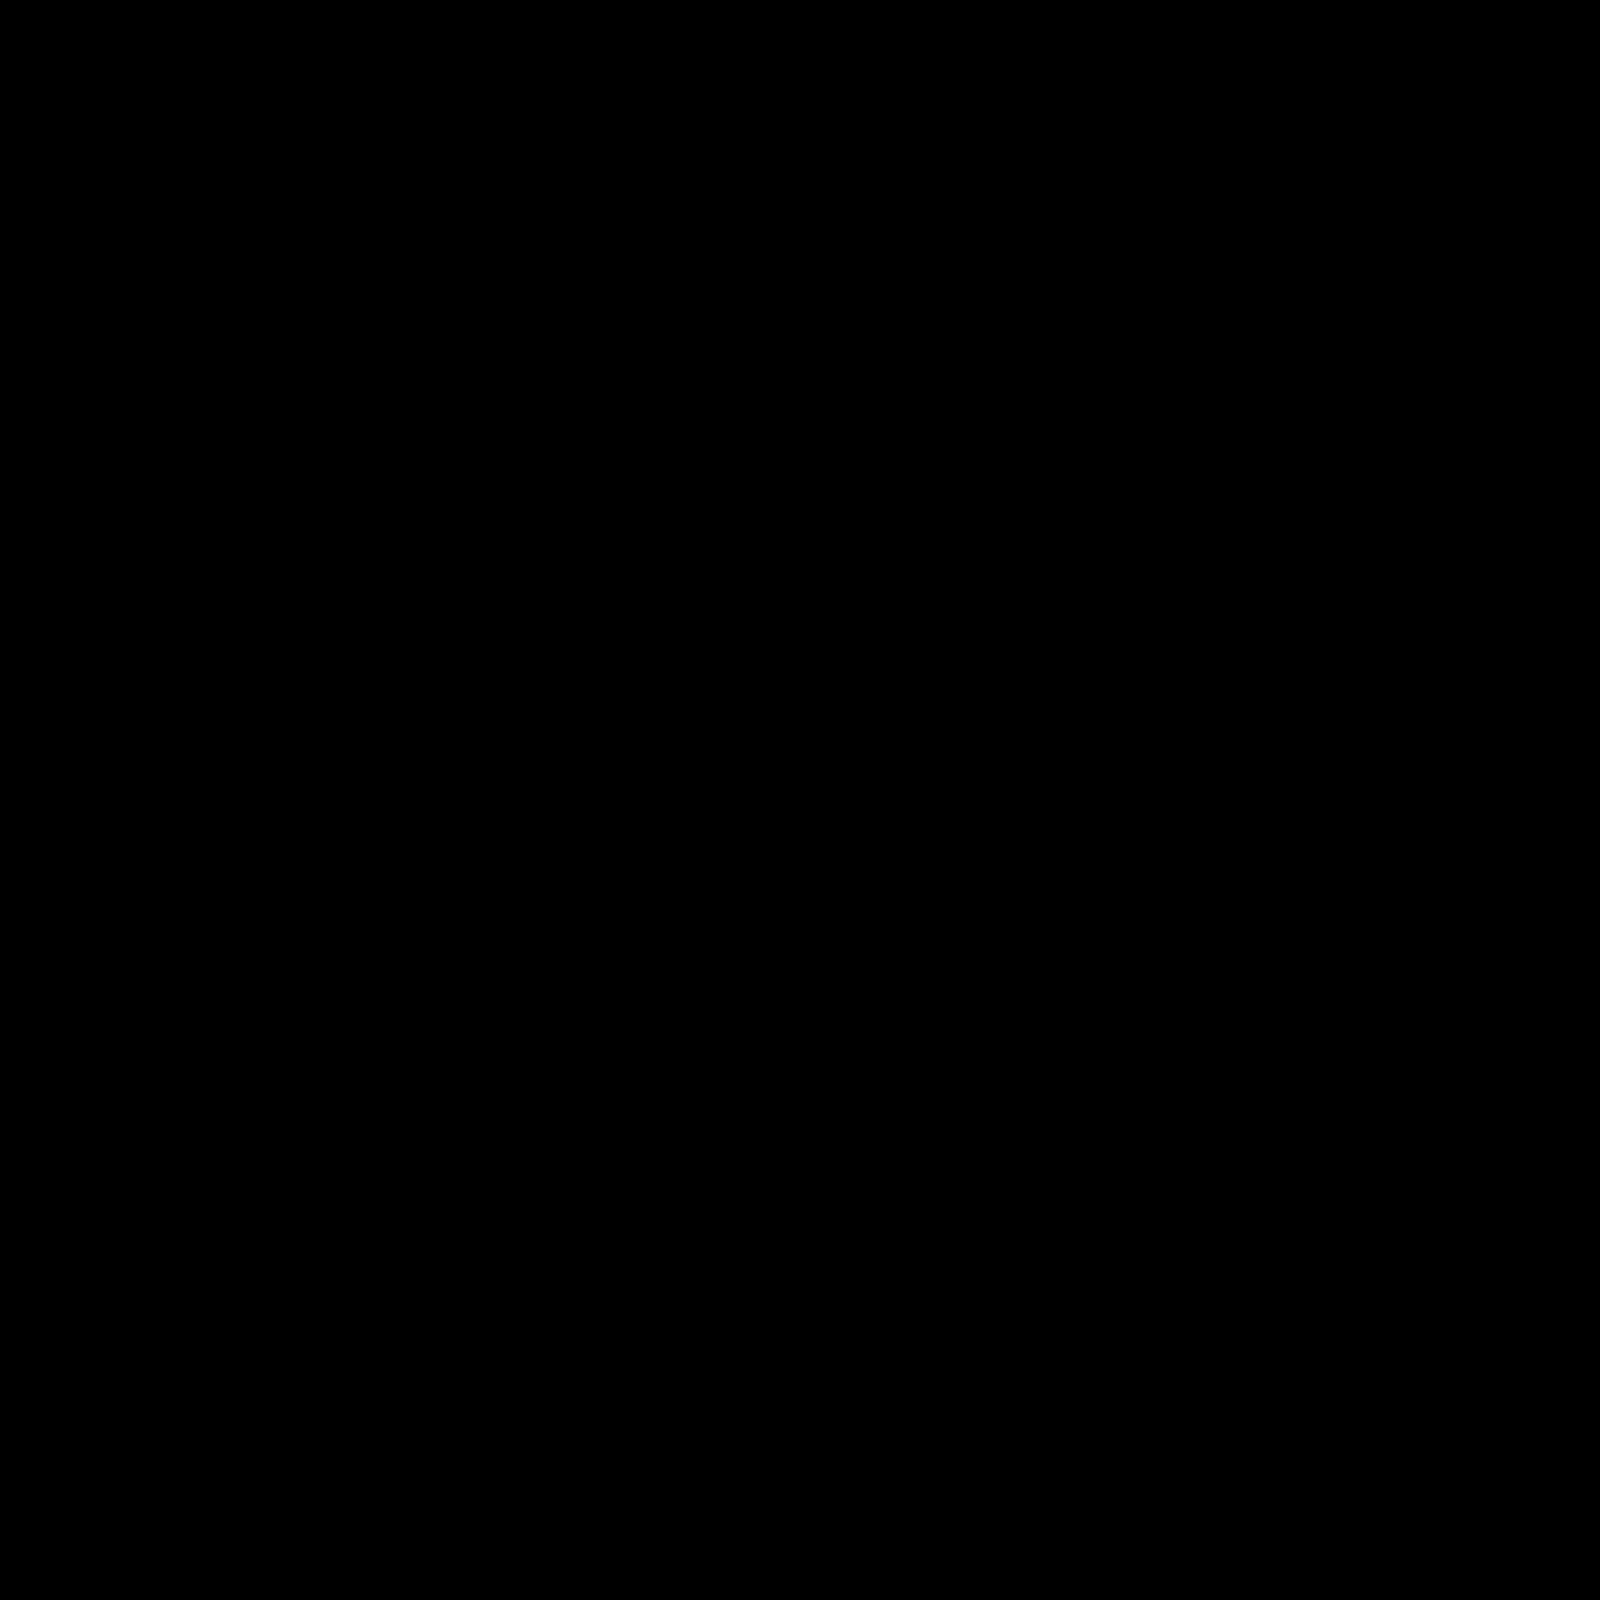 Christmas Berry icon